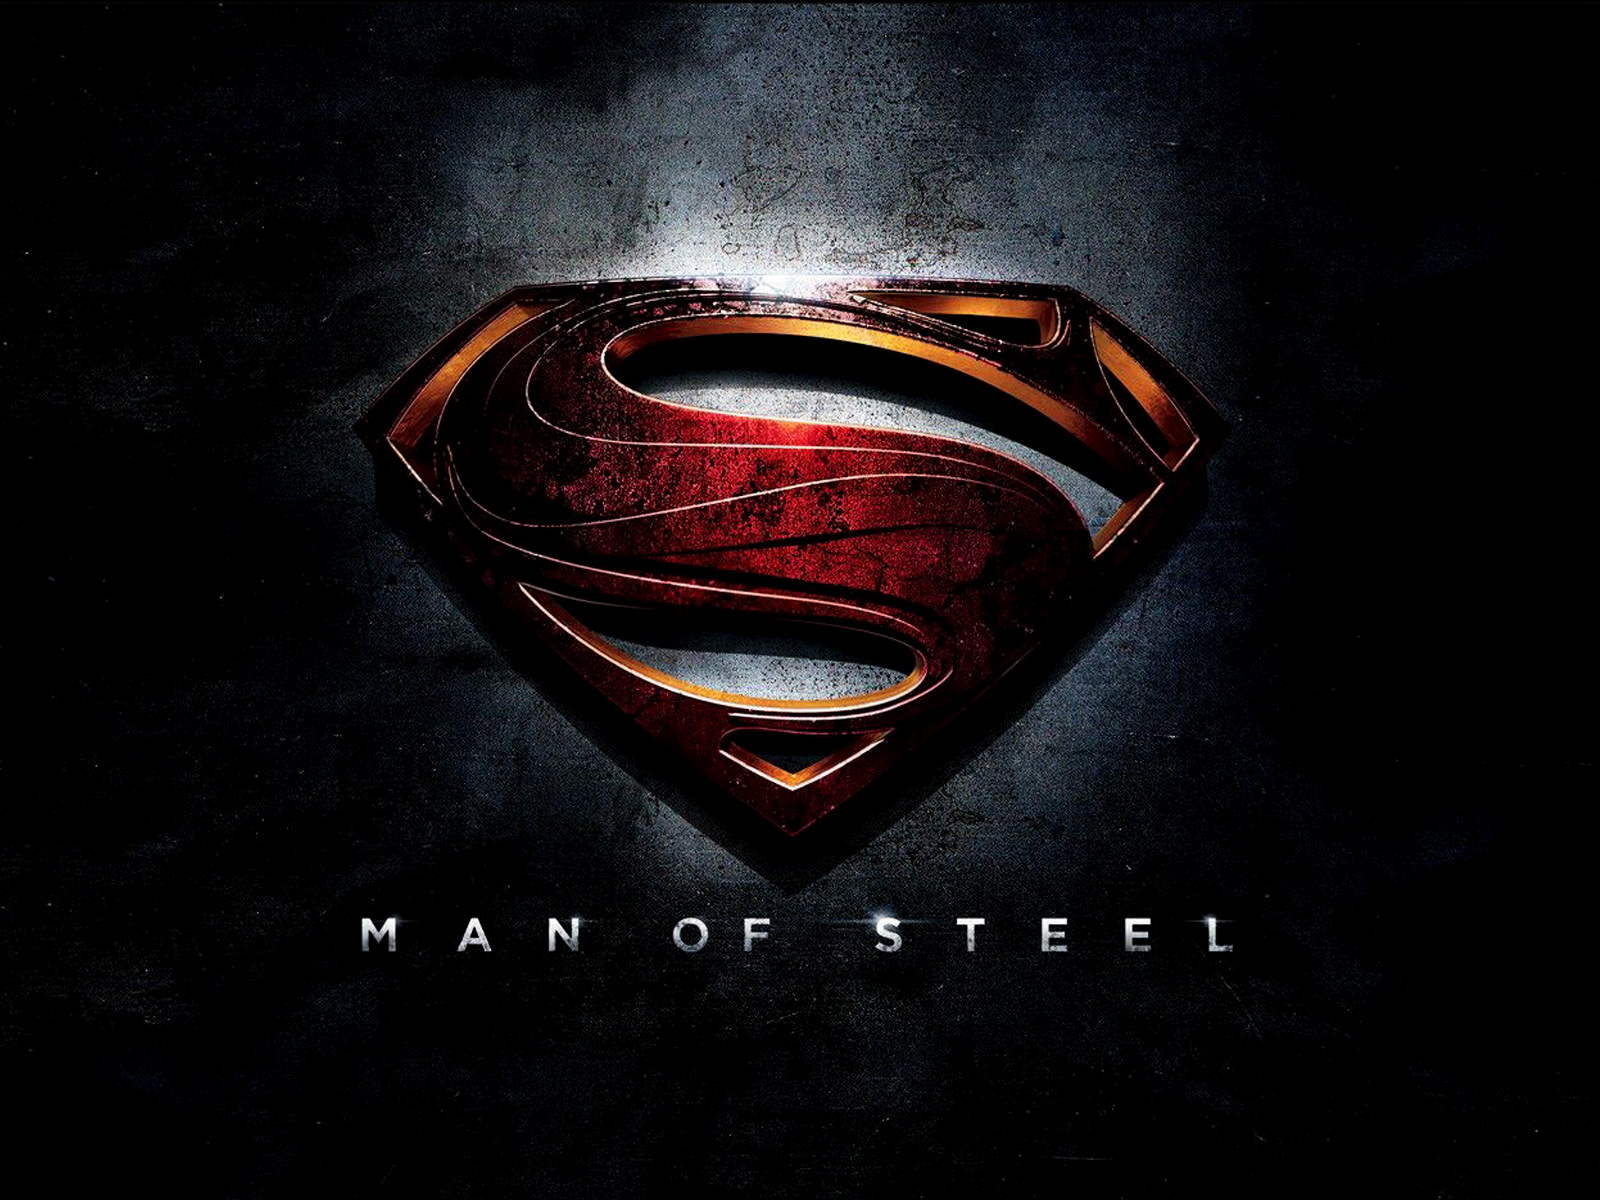 of Steel Superman 2013 HD Wallpapers Download Wallpapers in HD 1600x1200